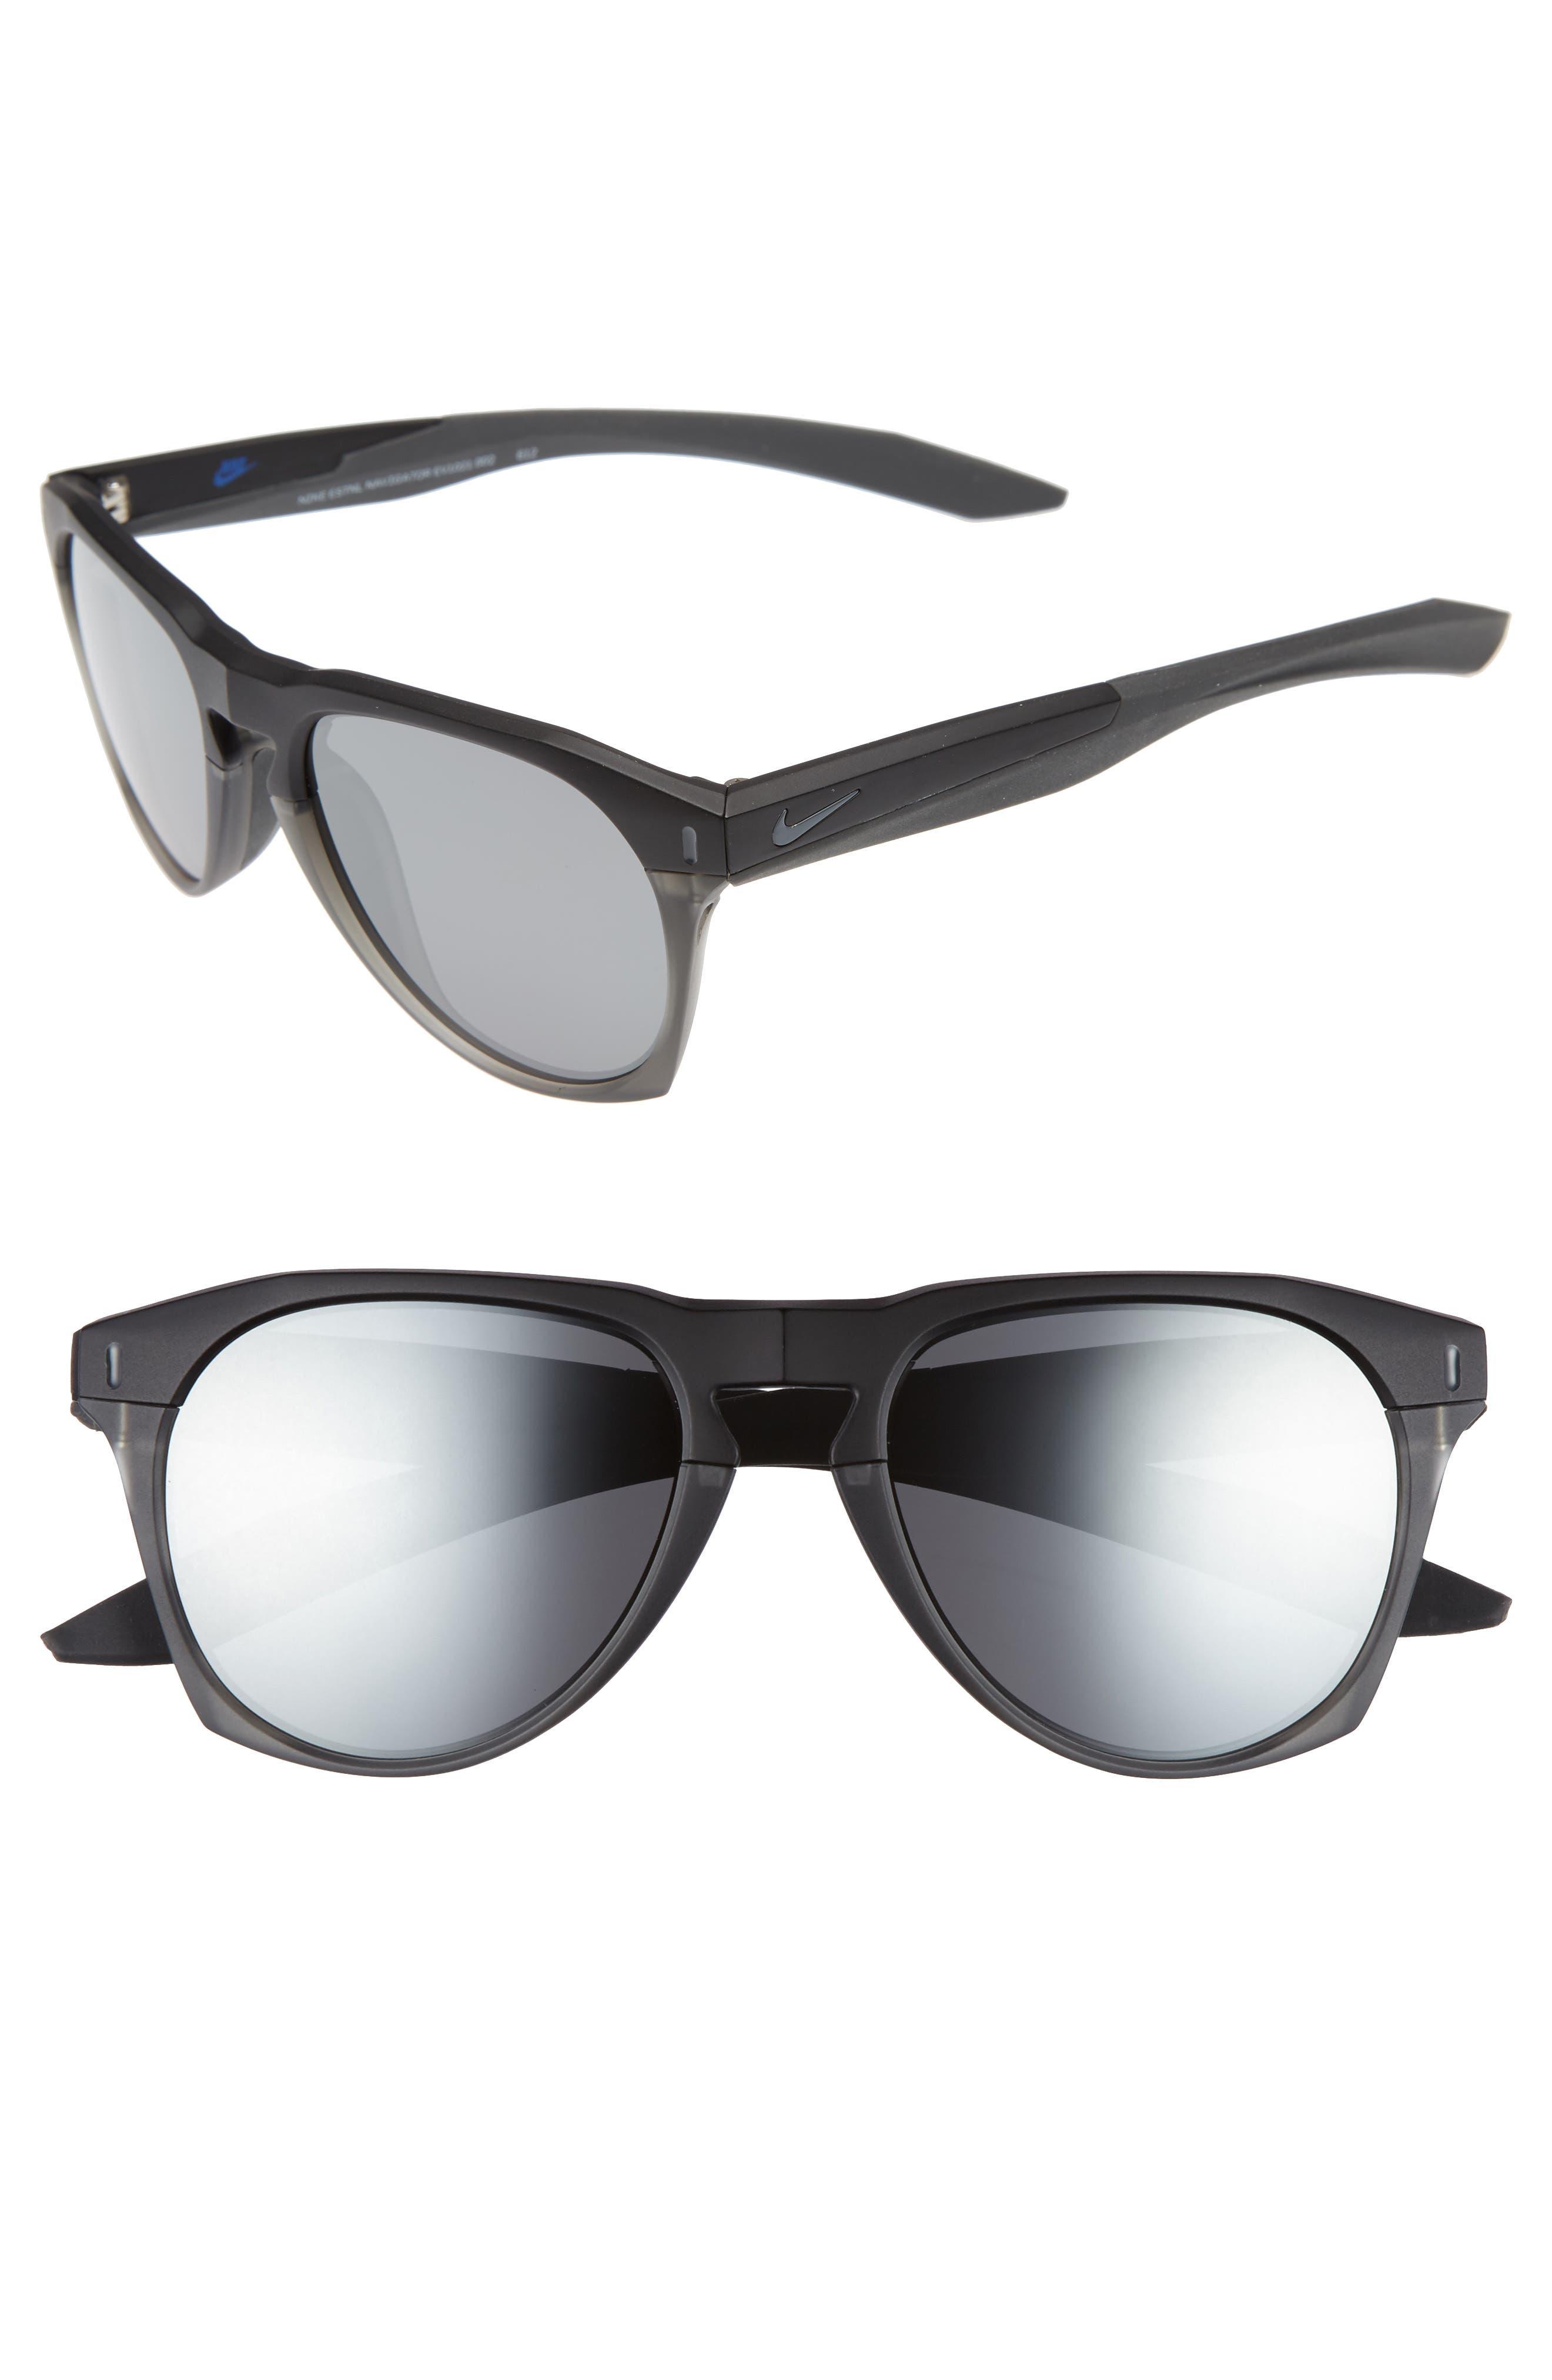 Essential Navigator 54mm Sunglasses,                             Main thumbnail 1, color,                             Matte Black / Anthracite